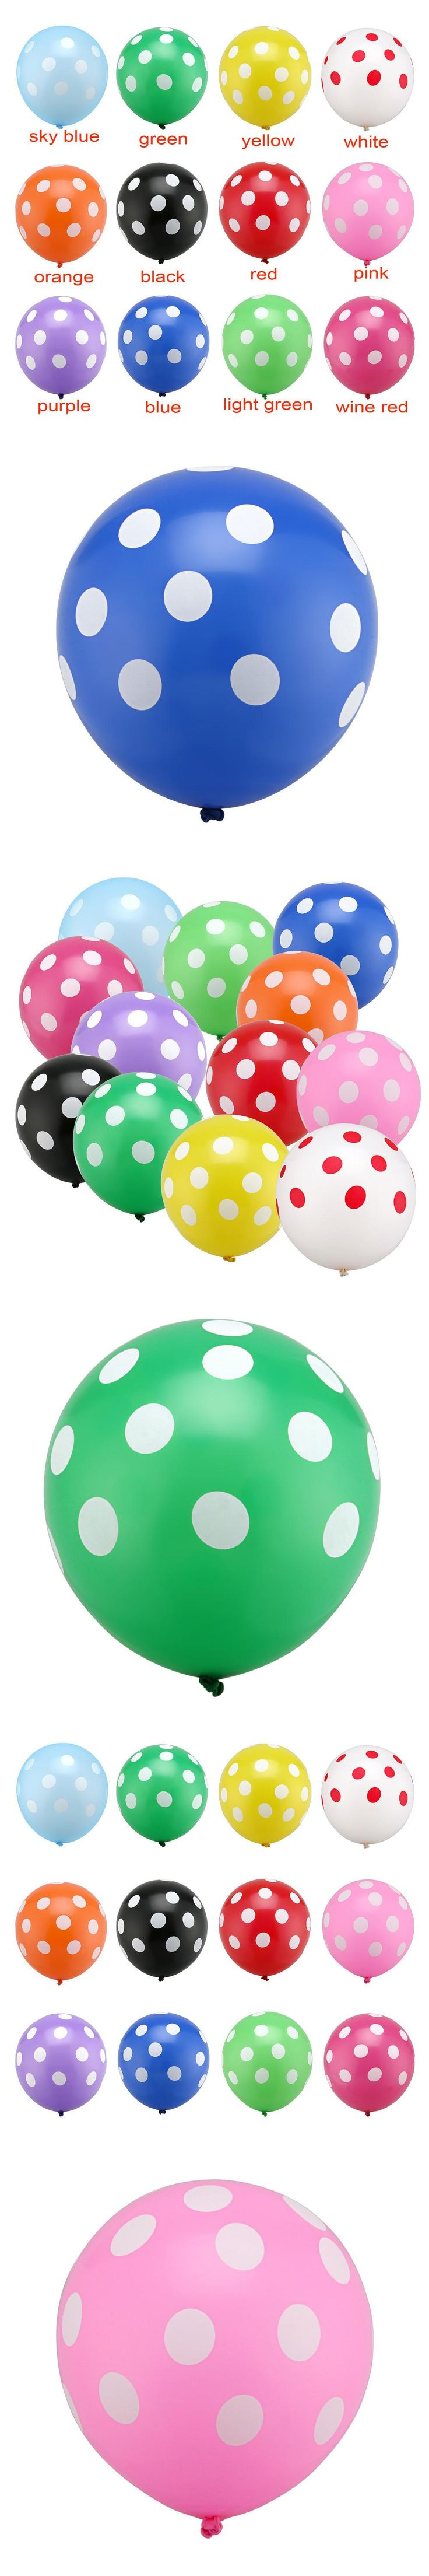 20pc 12 inch Latex Polka Dots Balloons Wedding Birthday Balloons Decoration Globos Party Ballon palloncini anniversaire Kid Toys